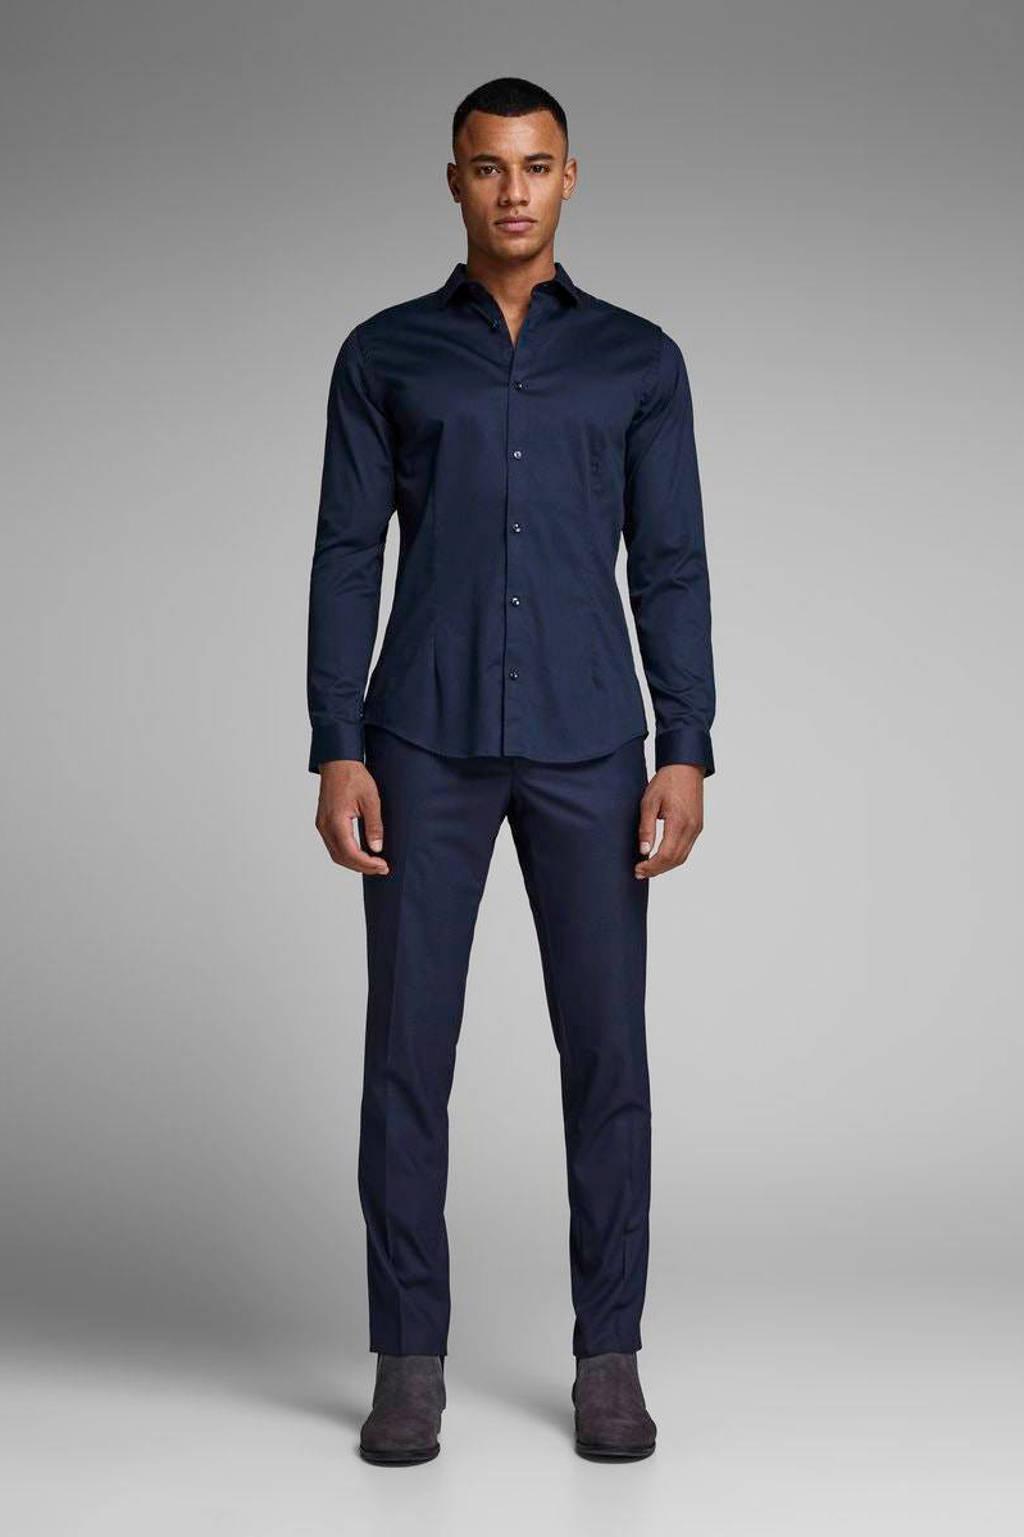 JACK & JONES PREMIUM Parma super slim fit overhemd, Navy